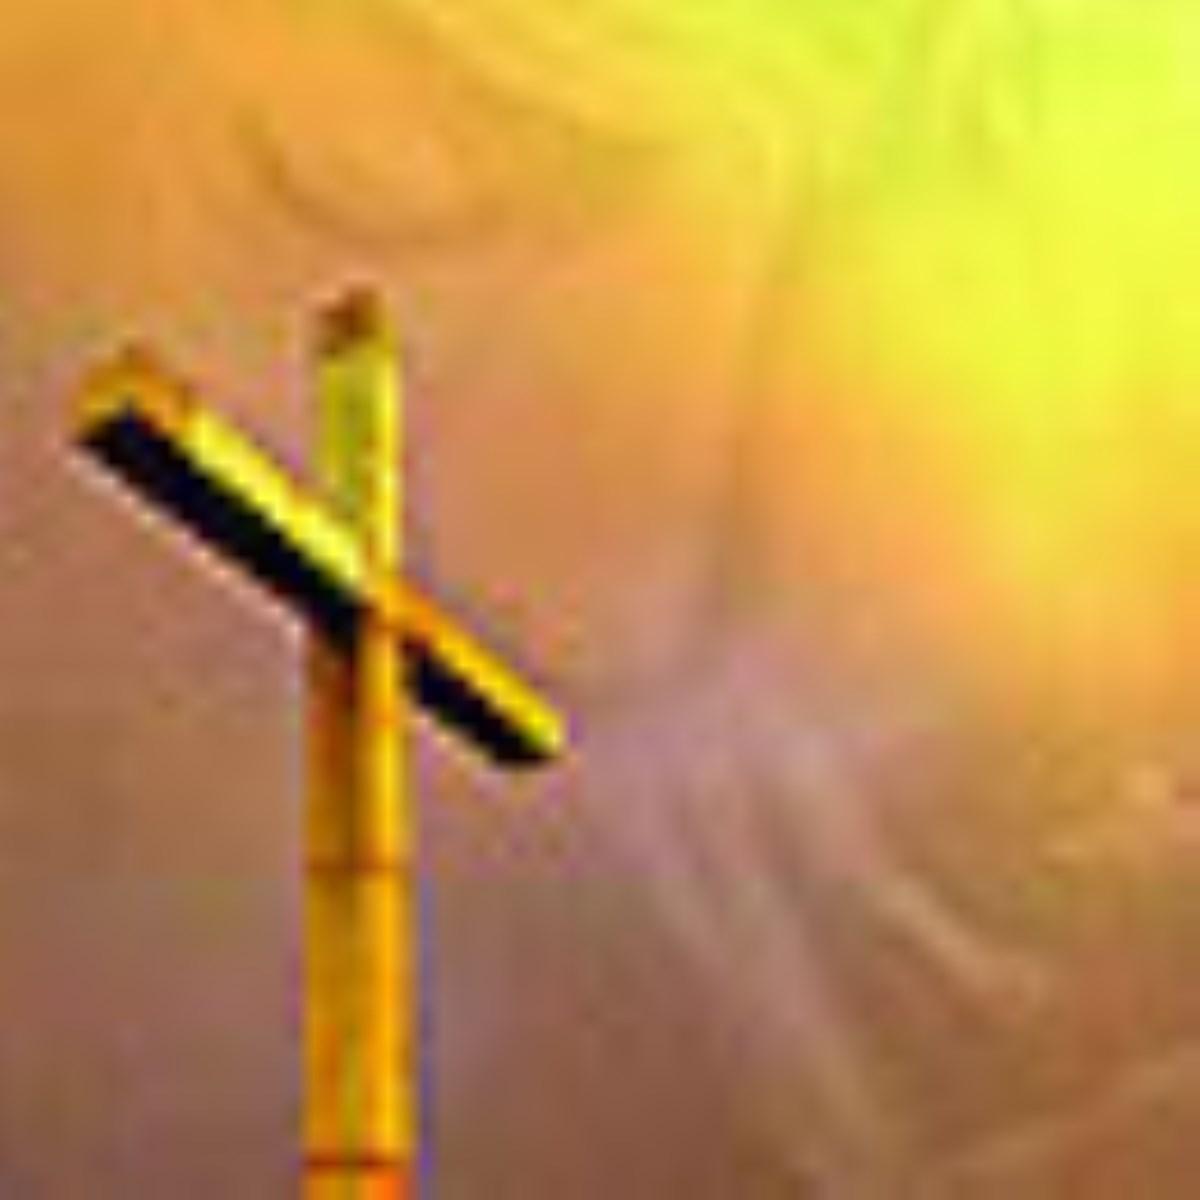 مسیحیت و حل مشکل تثلیث (2)